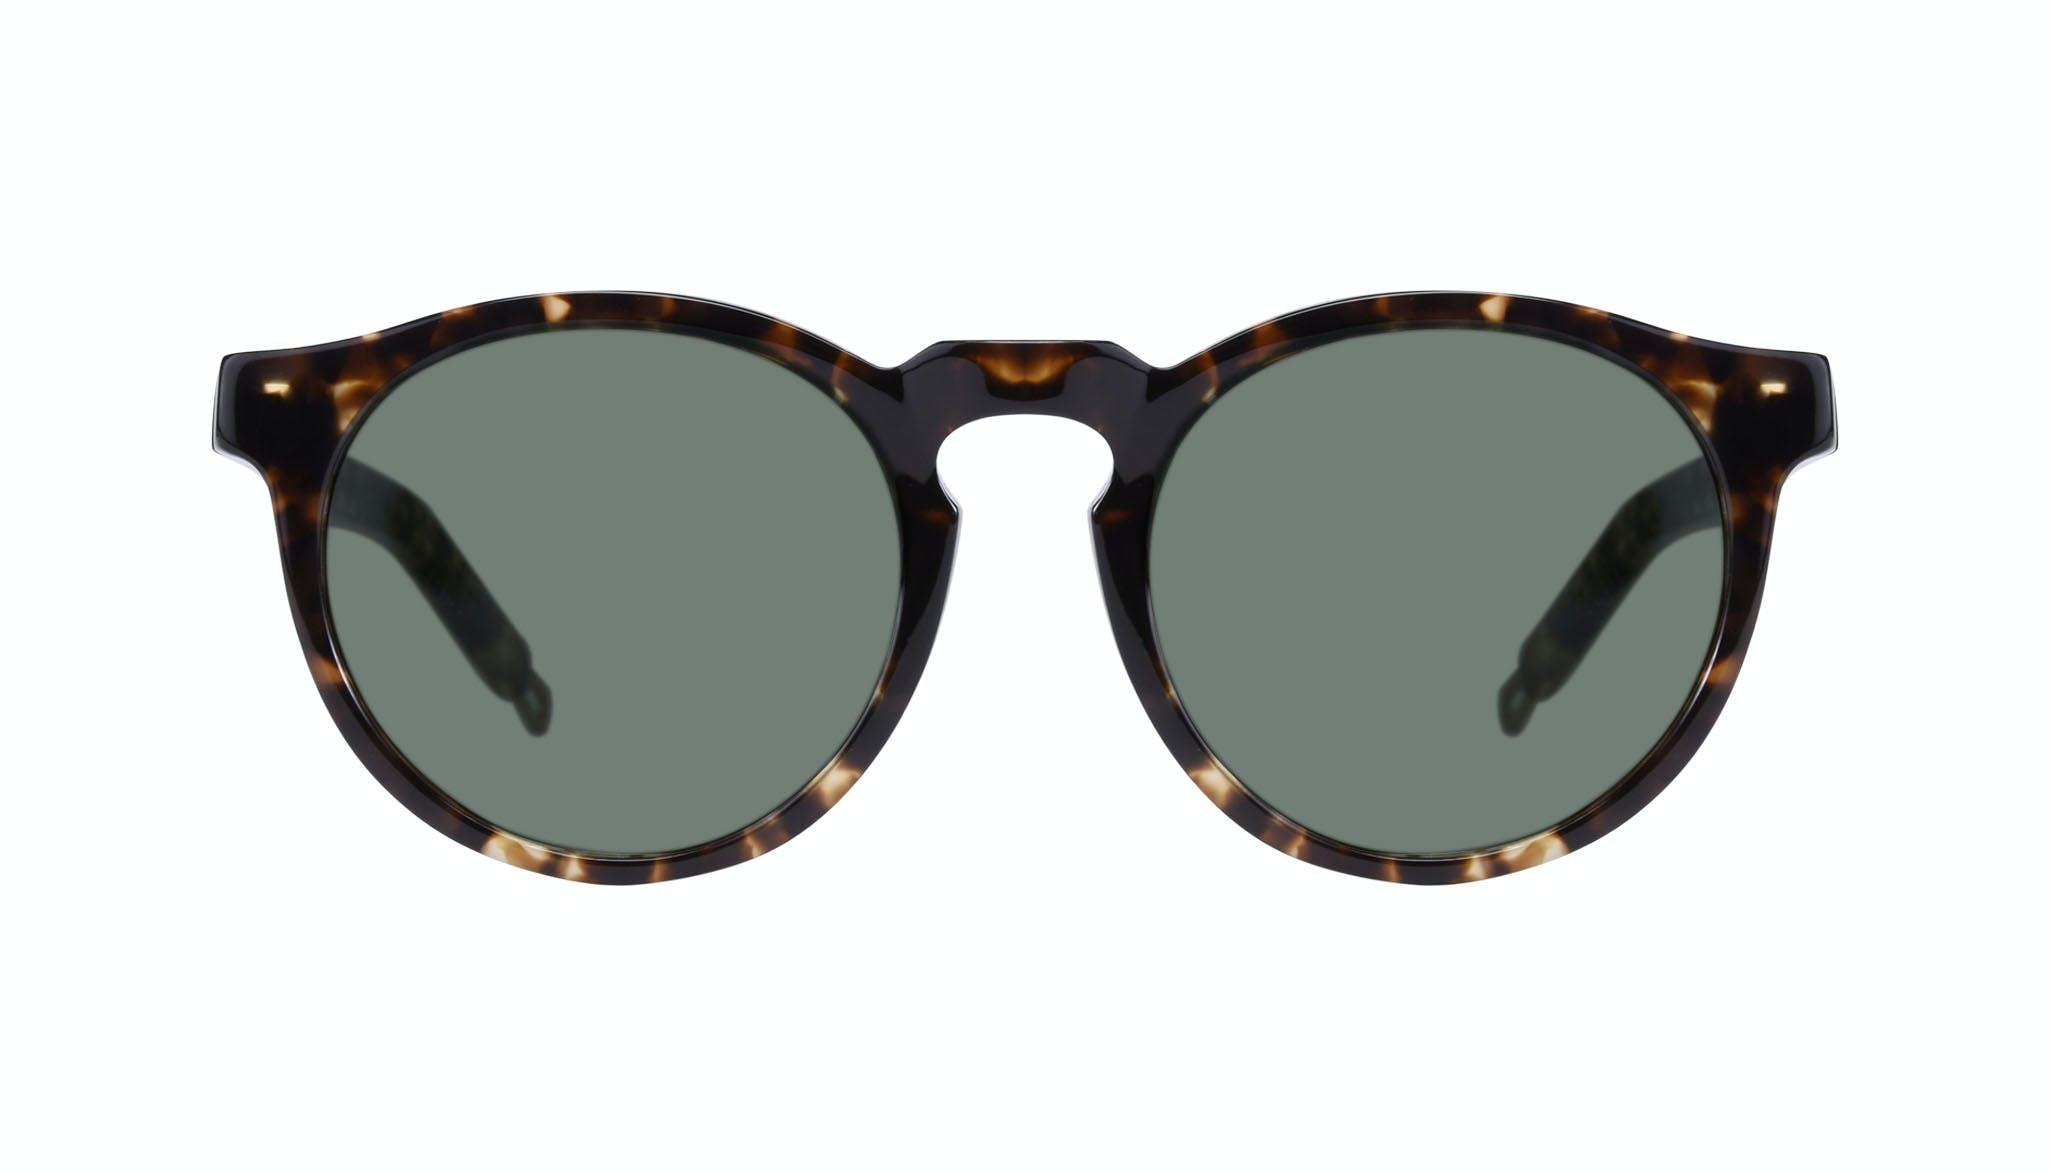 Affordable Fashion Glasses Round Sunglasses Men Ace Tortoise Front